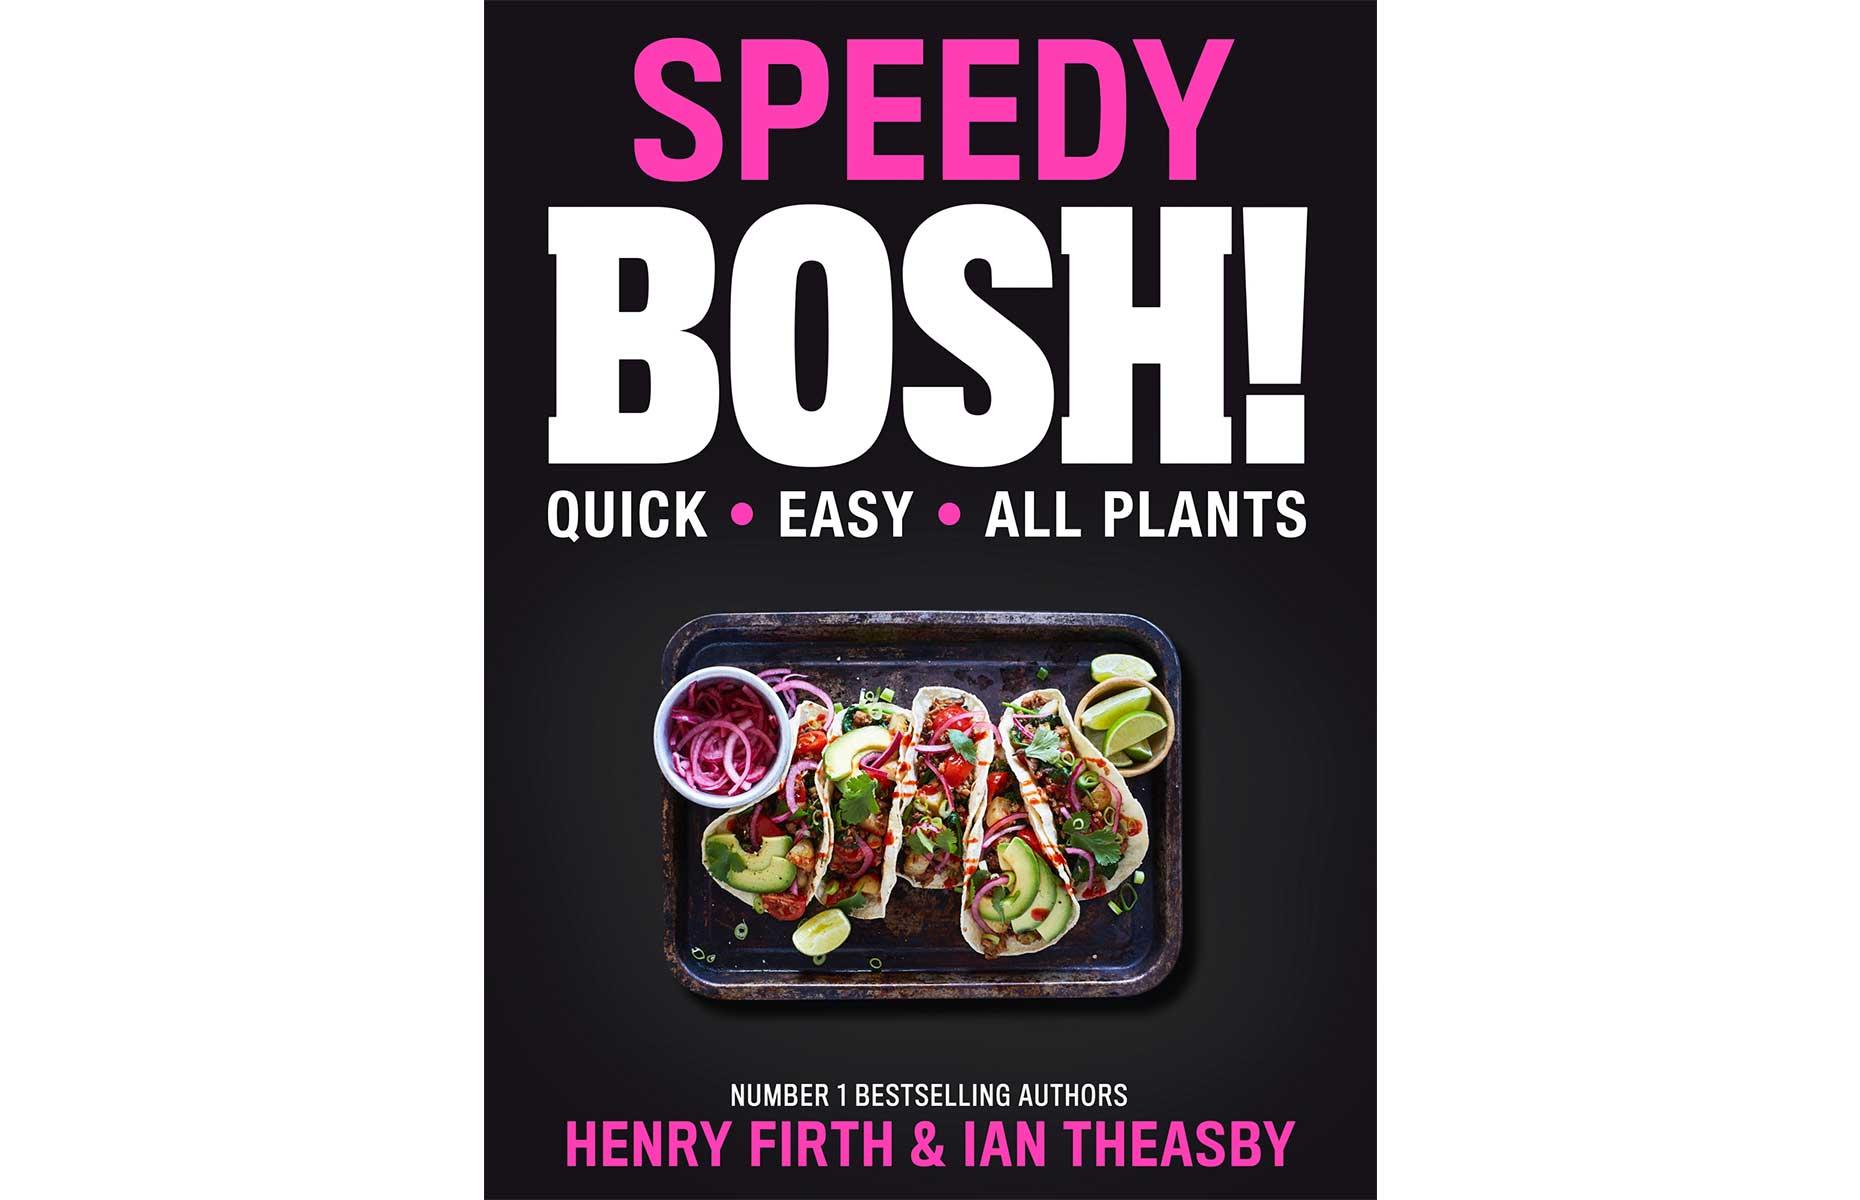 Speedy BOSH cookbook